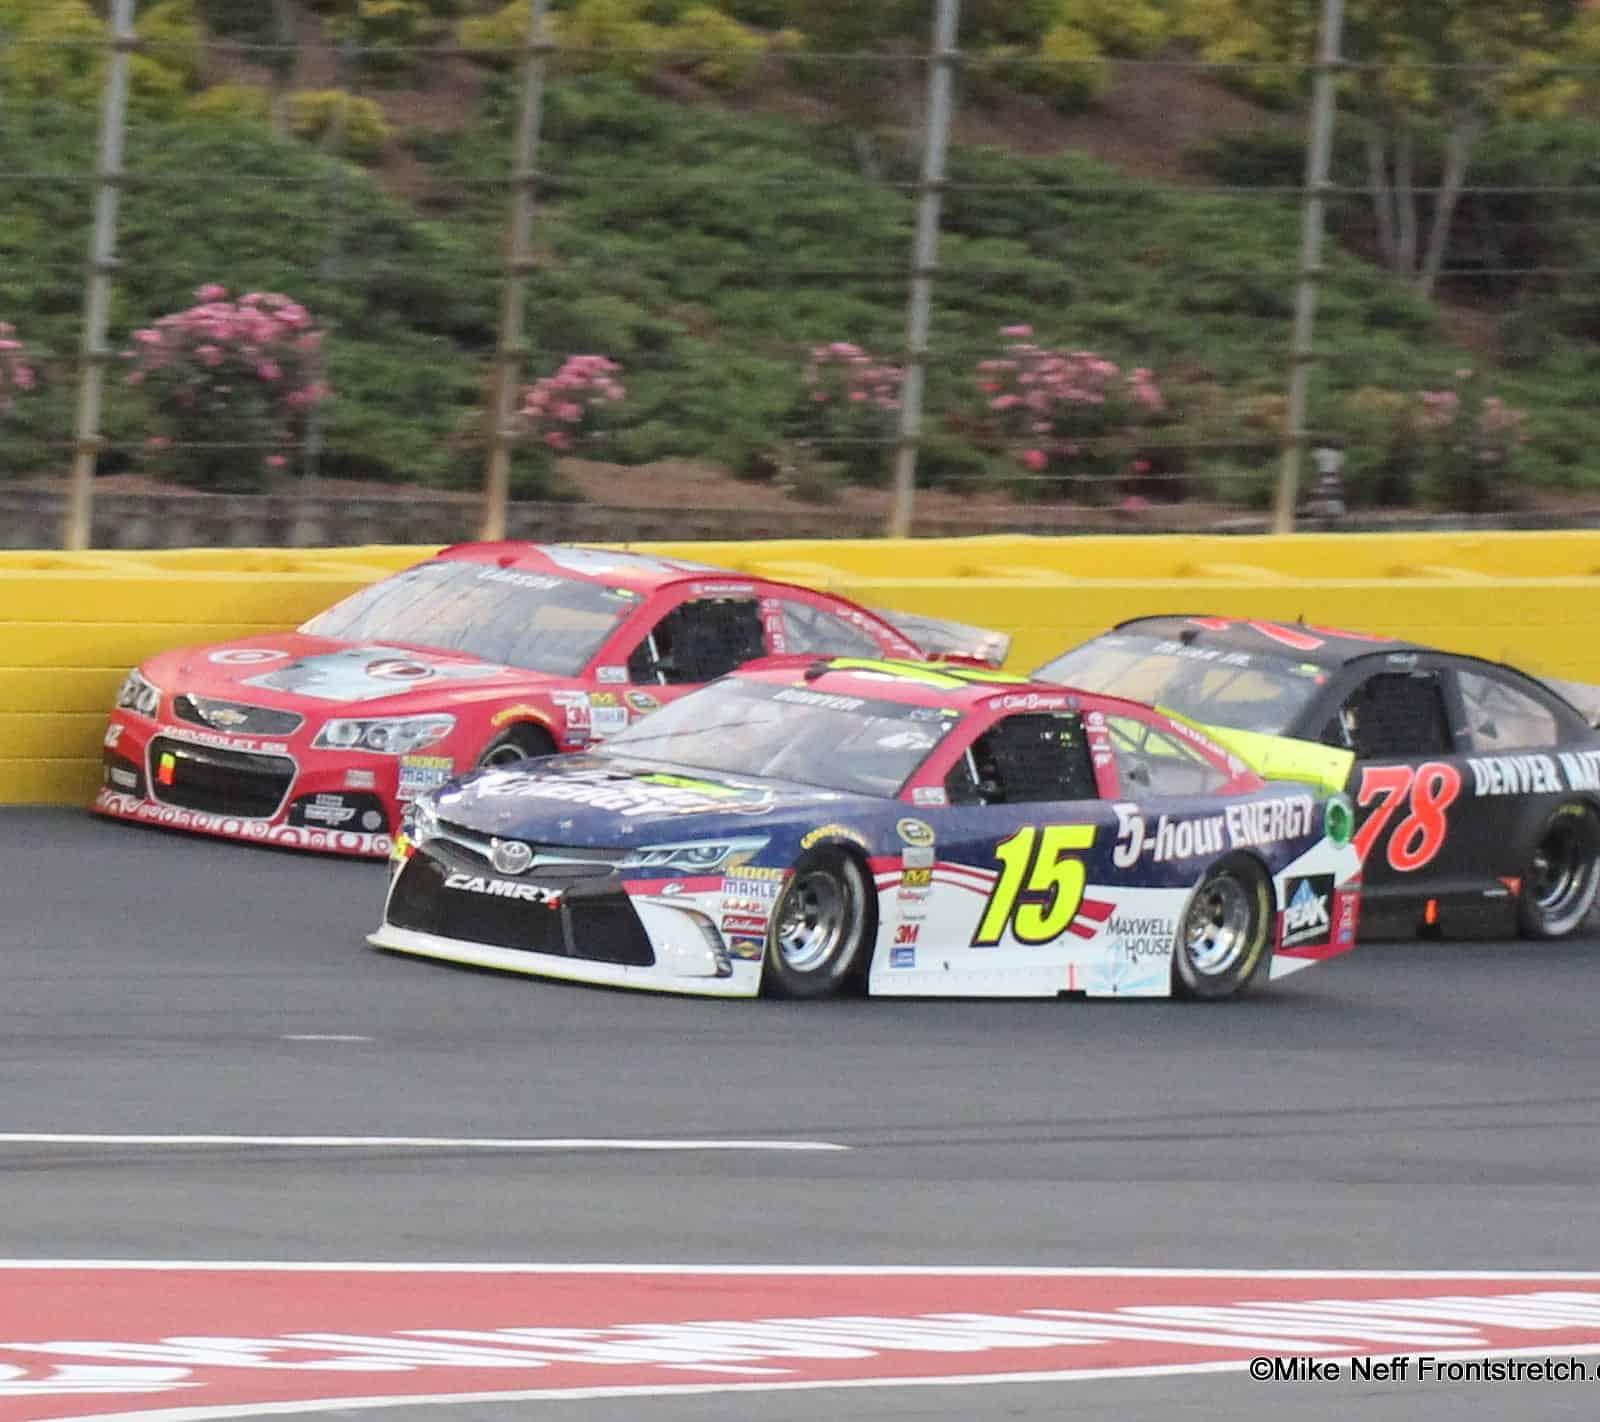 Clint Bowyer Martin Truex Jr Kyle Larson Cup Sprint Showdown 2015 Charlotte Mike Neff